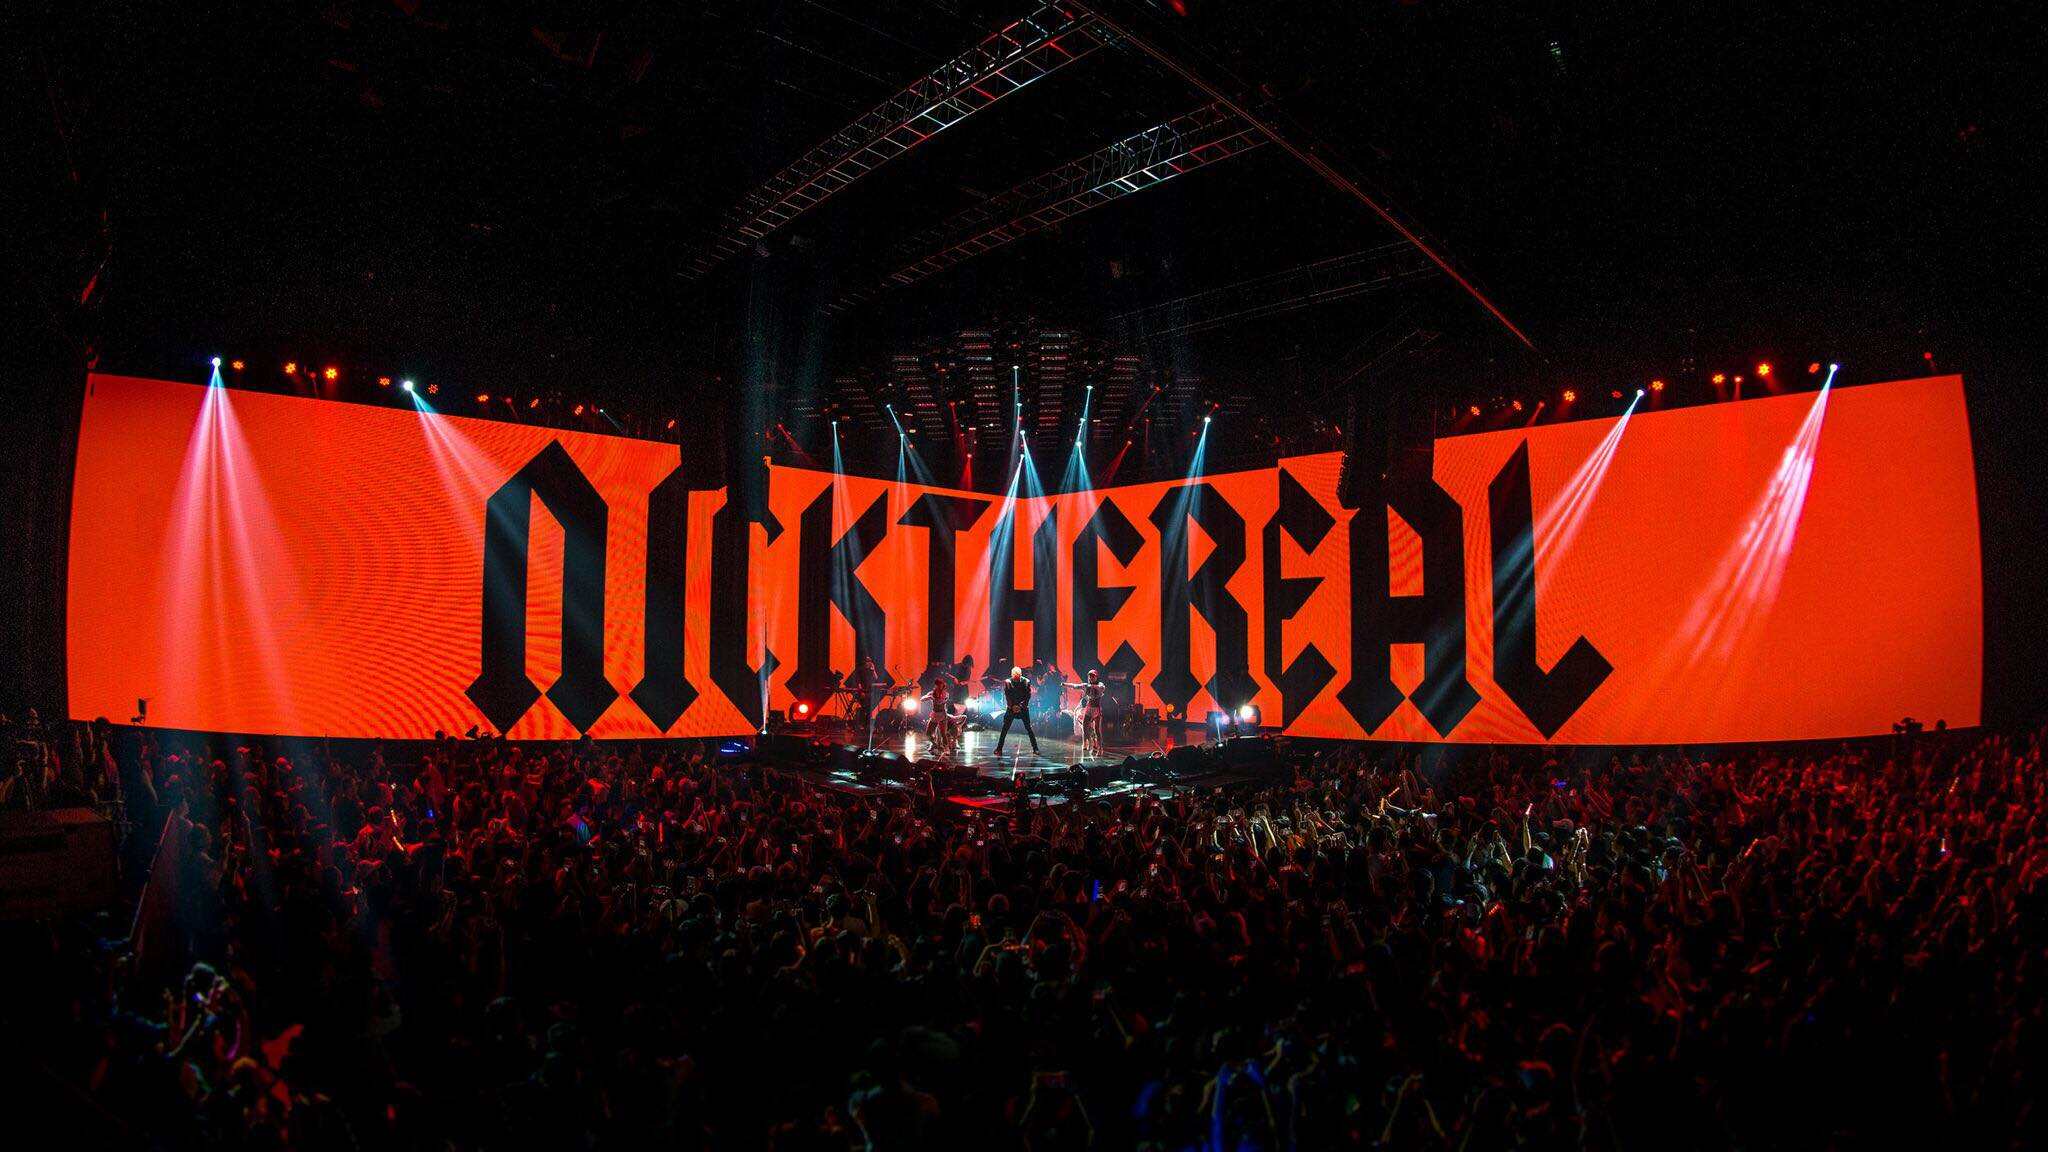 Announced: 周汤豪 NICKTHEREAL 帥到分手 Party Tour Malaysia 2017!